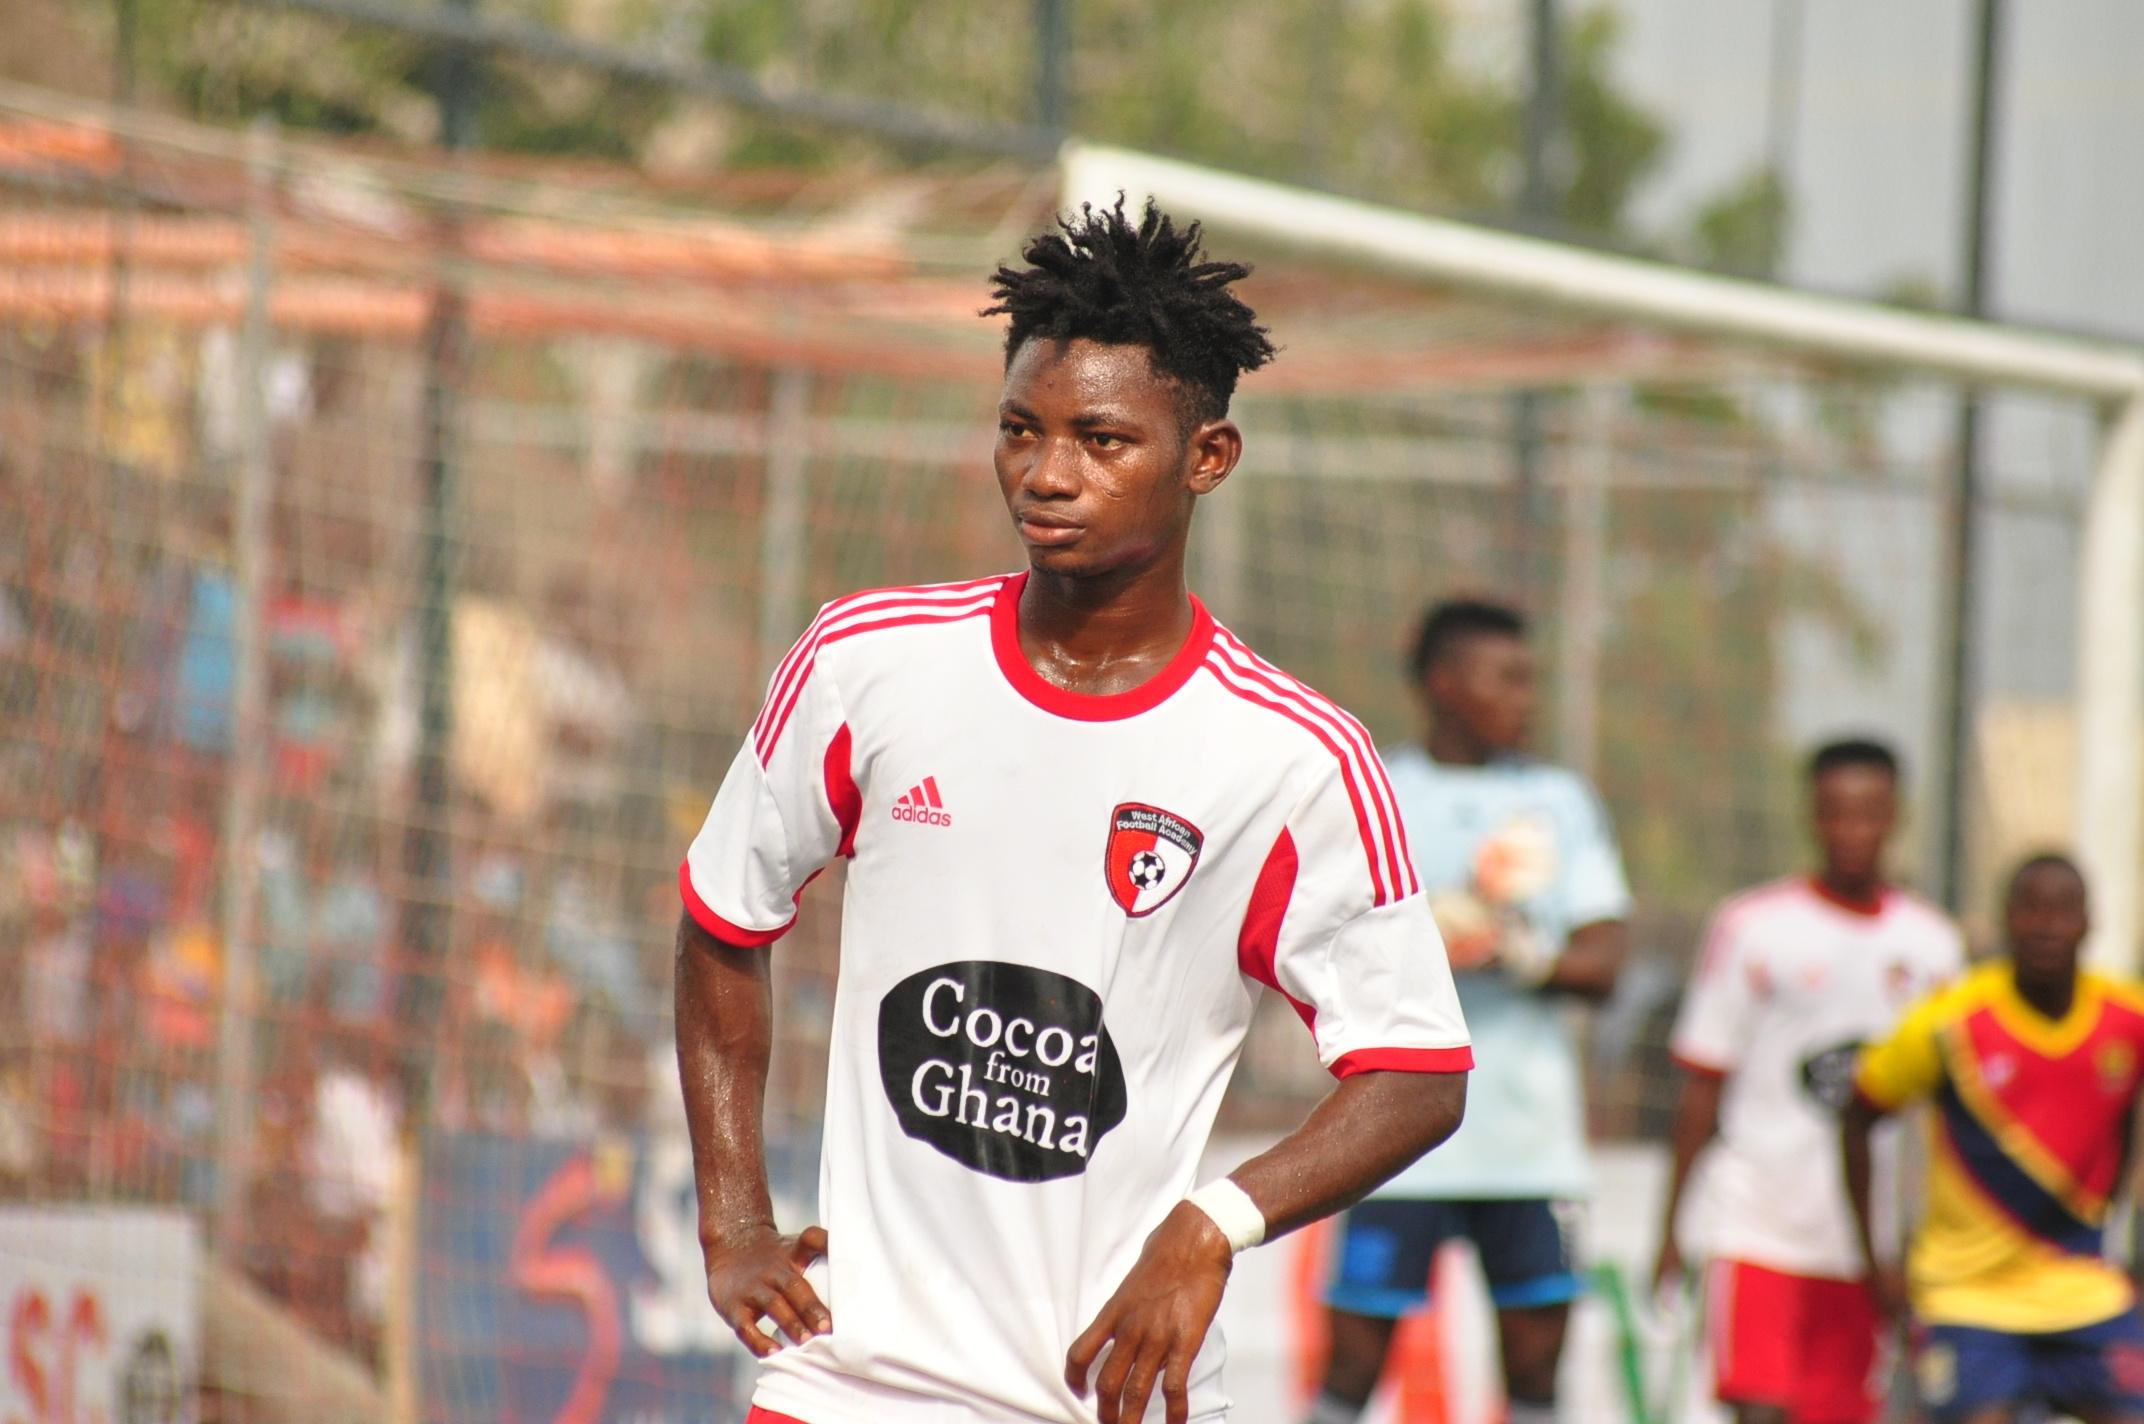 WAFA SC captain Gideon Waja satisfied with early season form